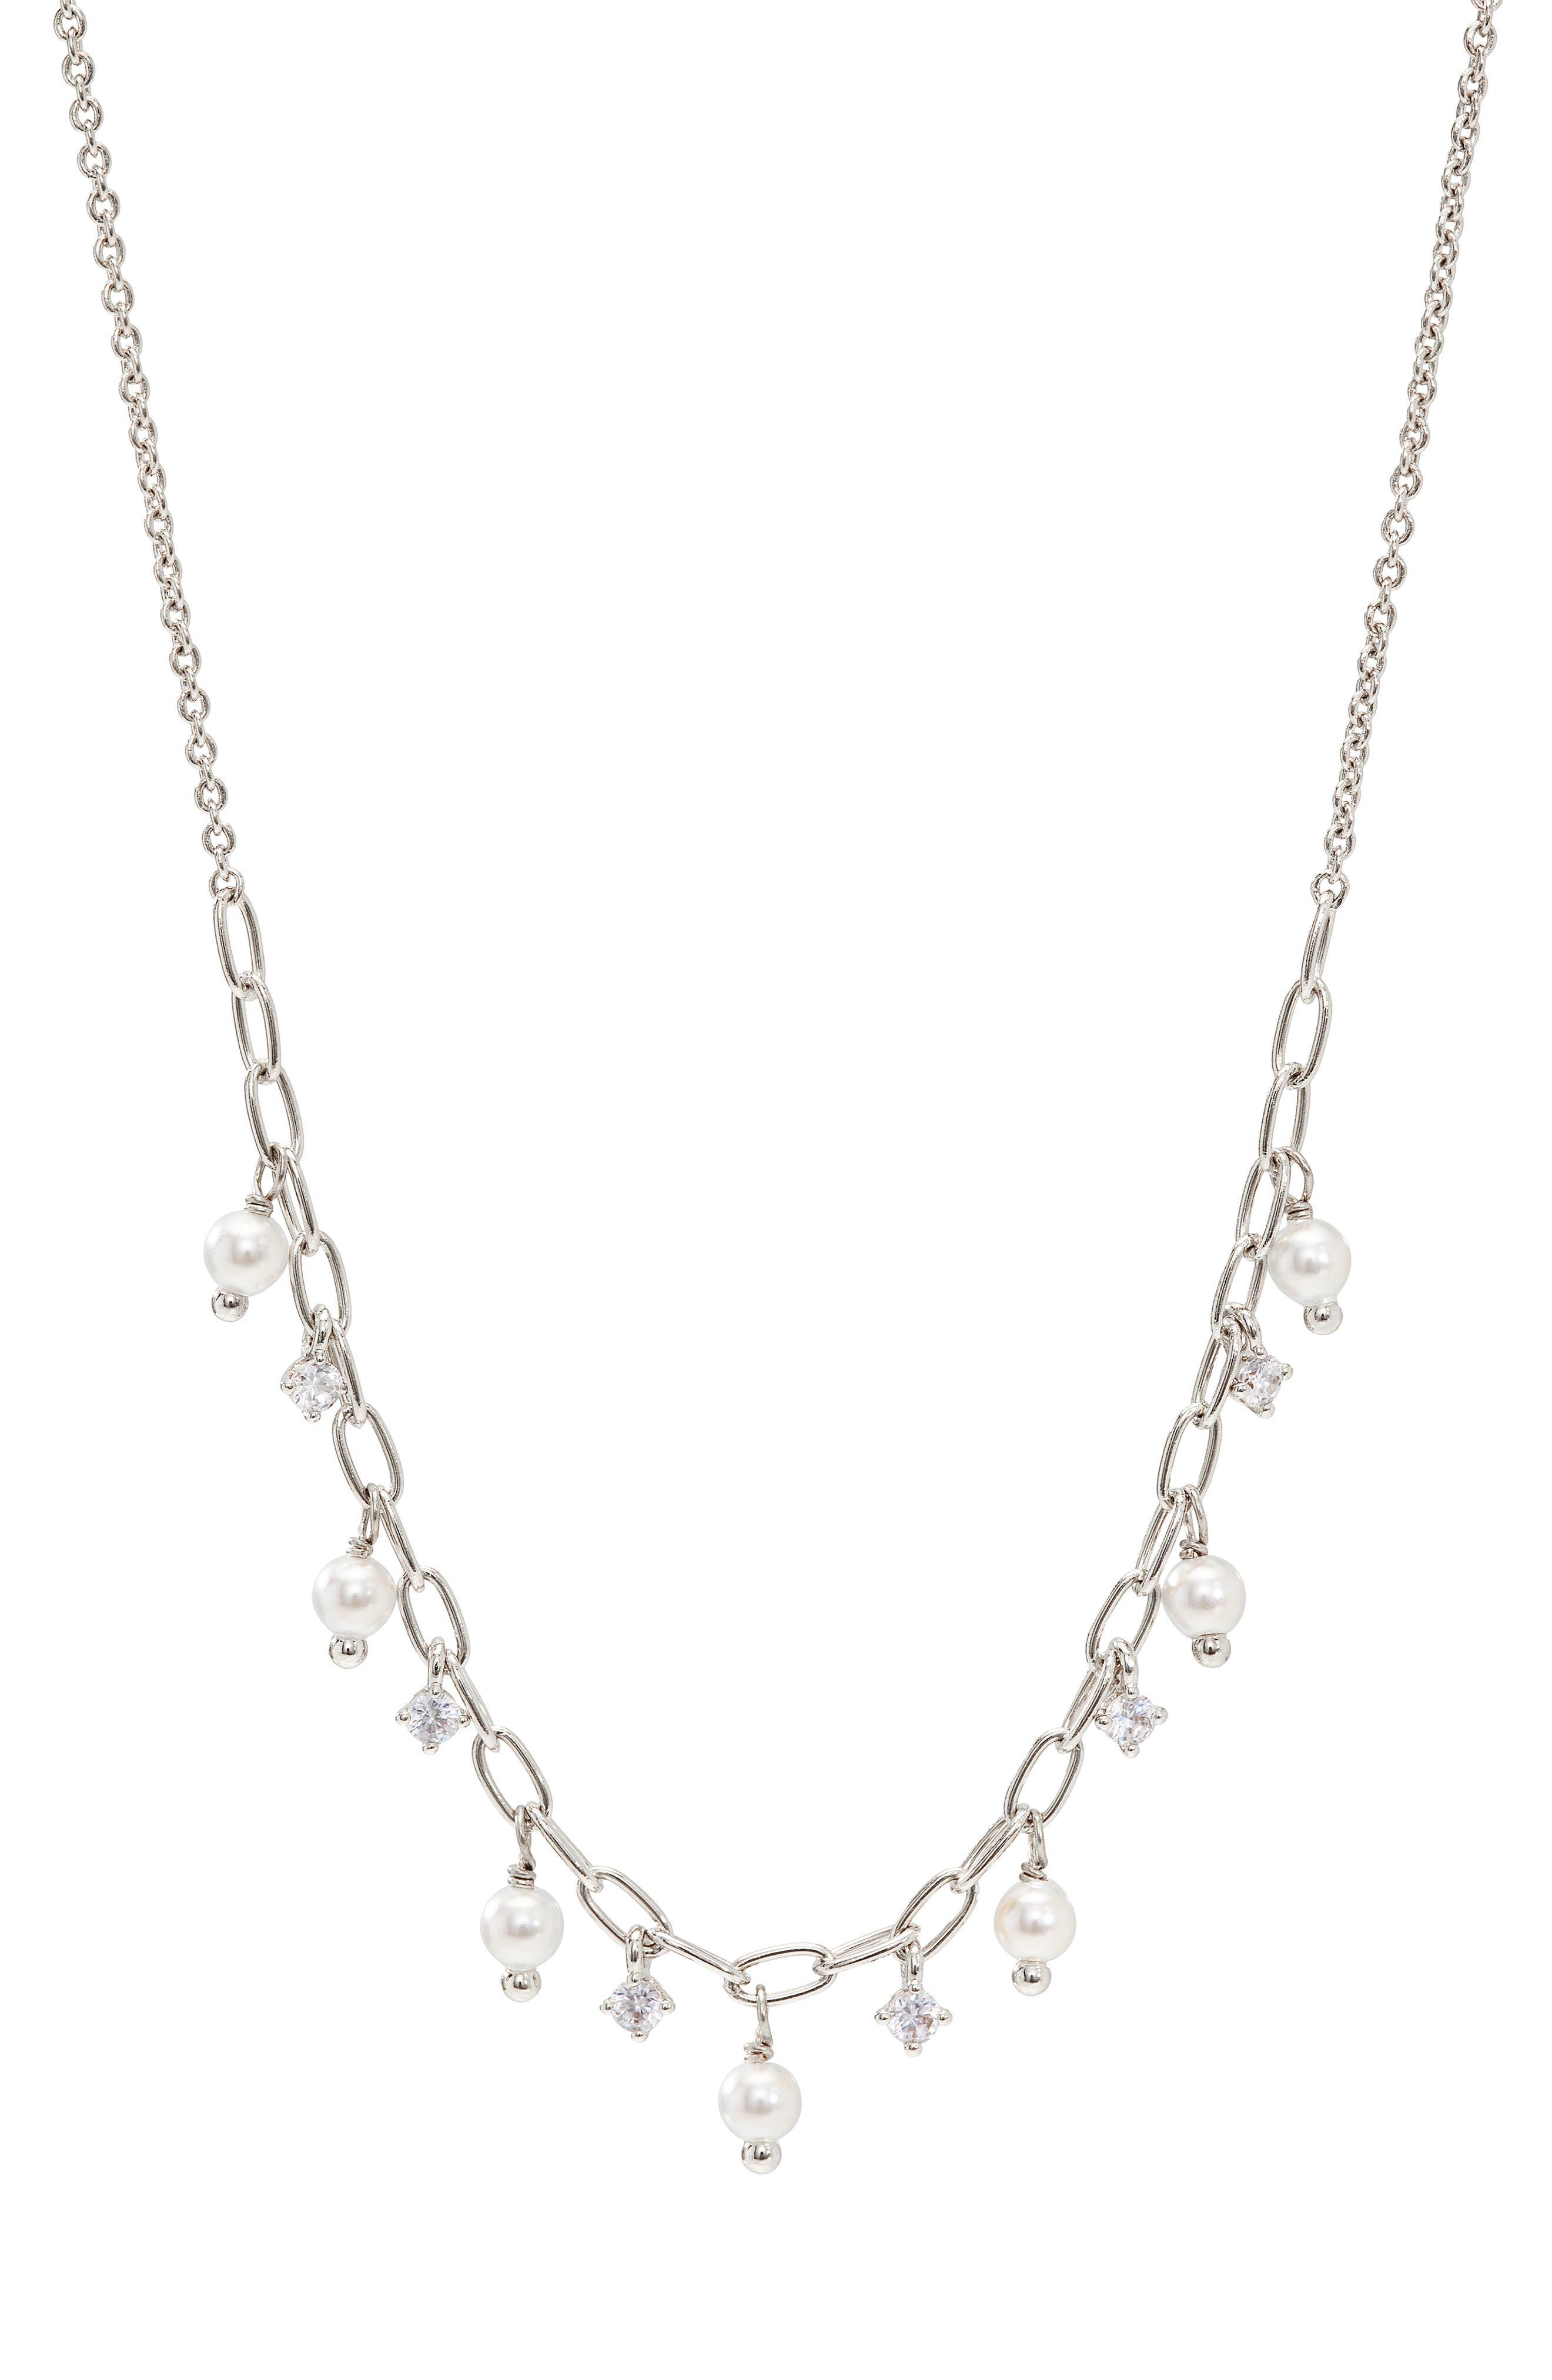 Cubic Zirconia & Swarovski Pearl Necklace